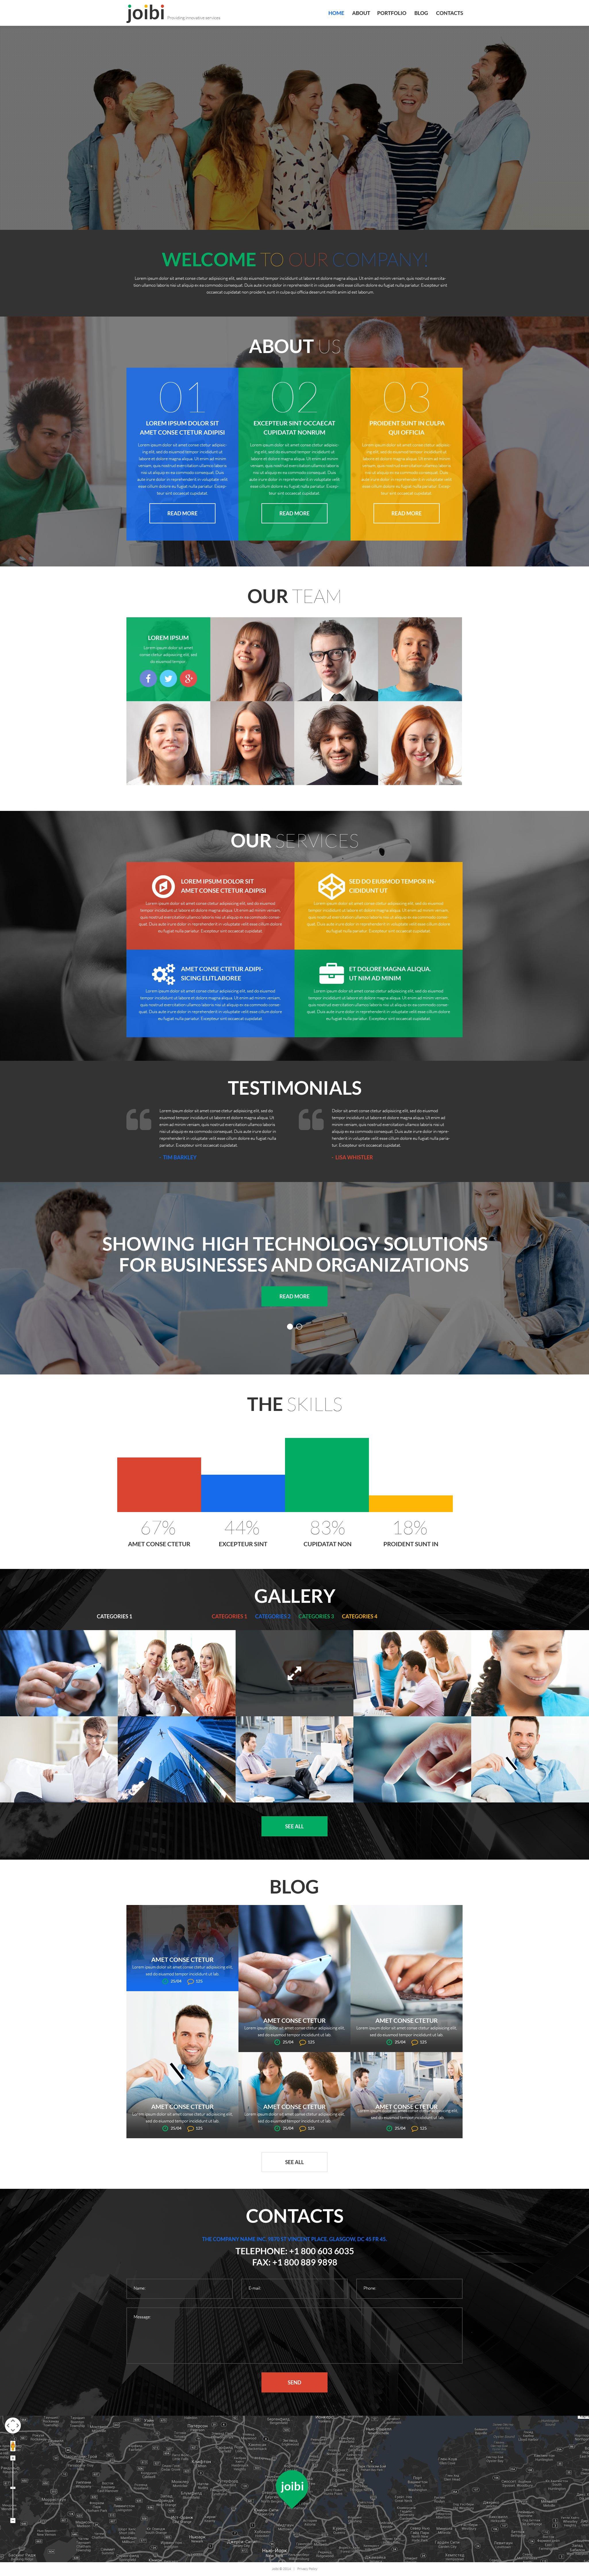 """Business Services Promotion"" thème WordPress adaptatif #52442 - screenshot"